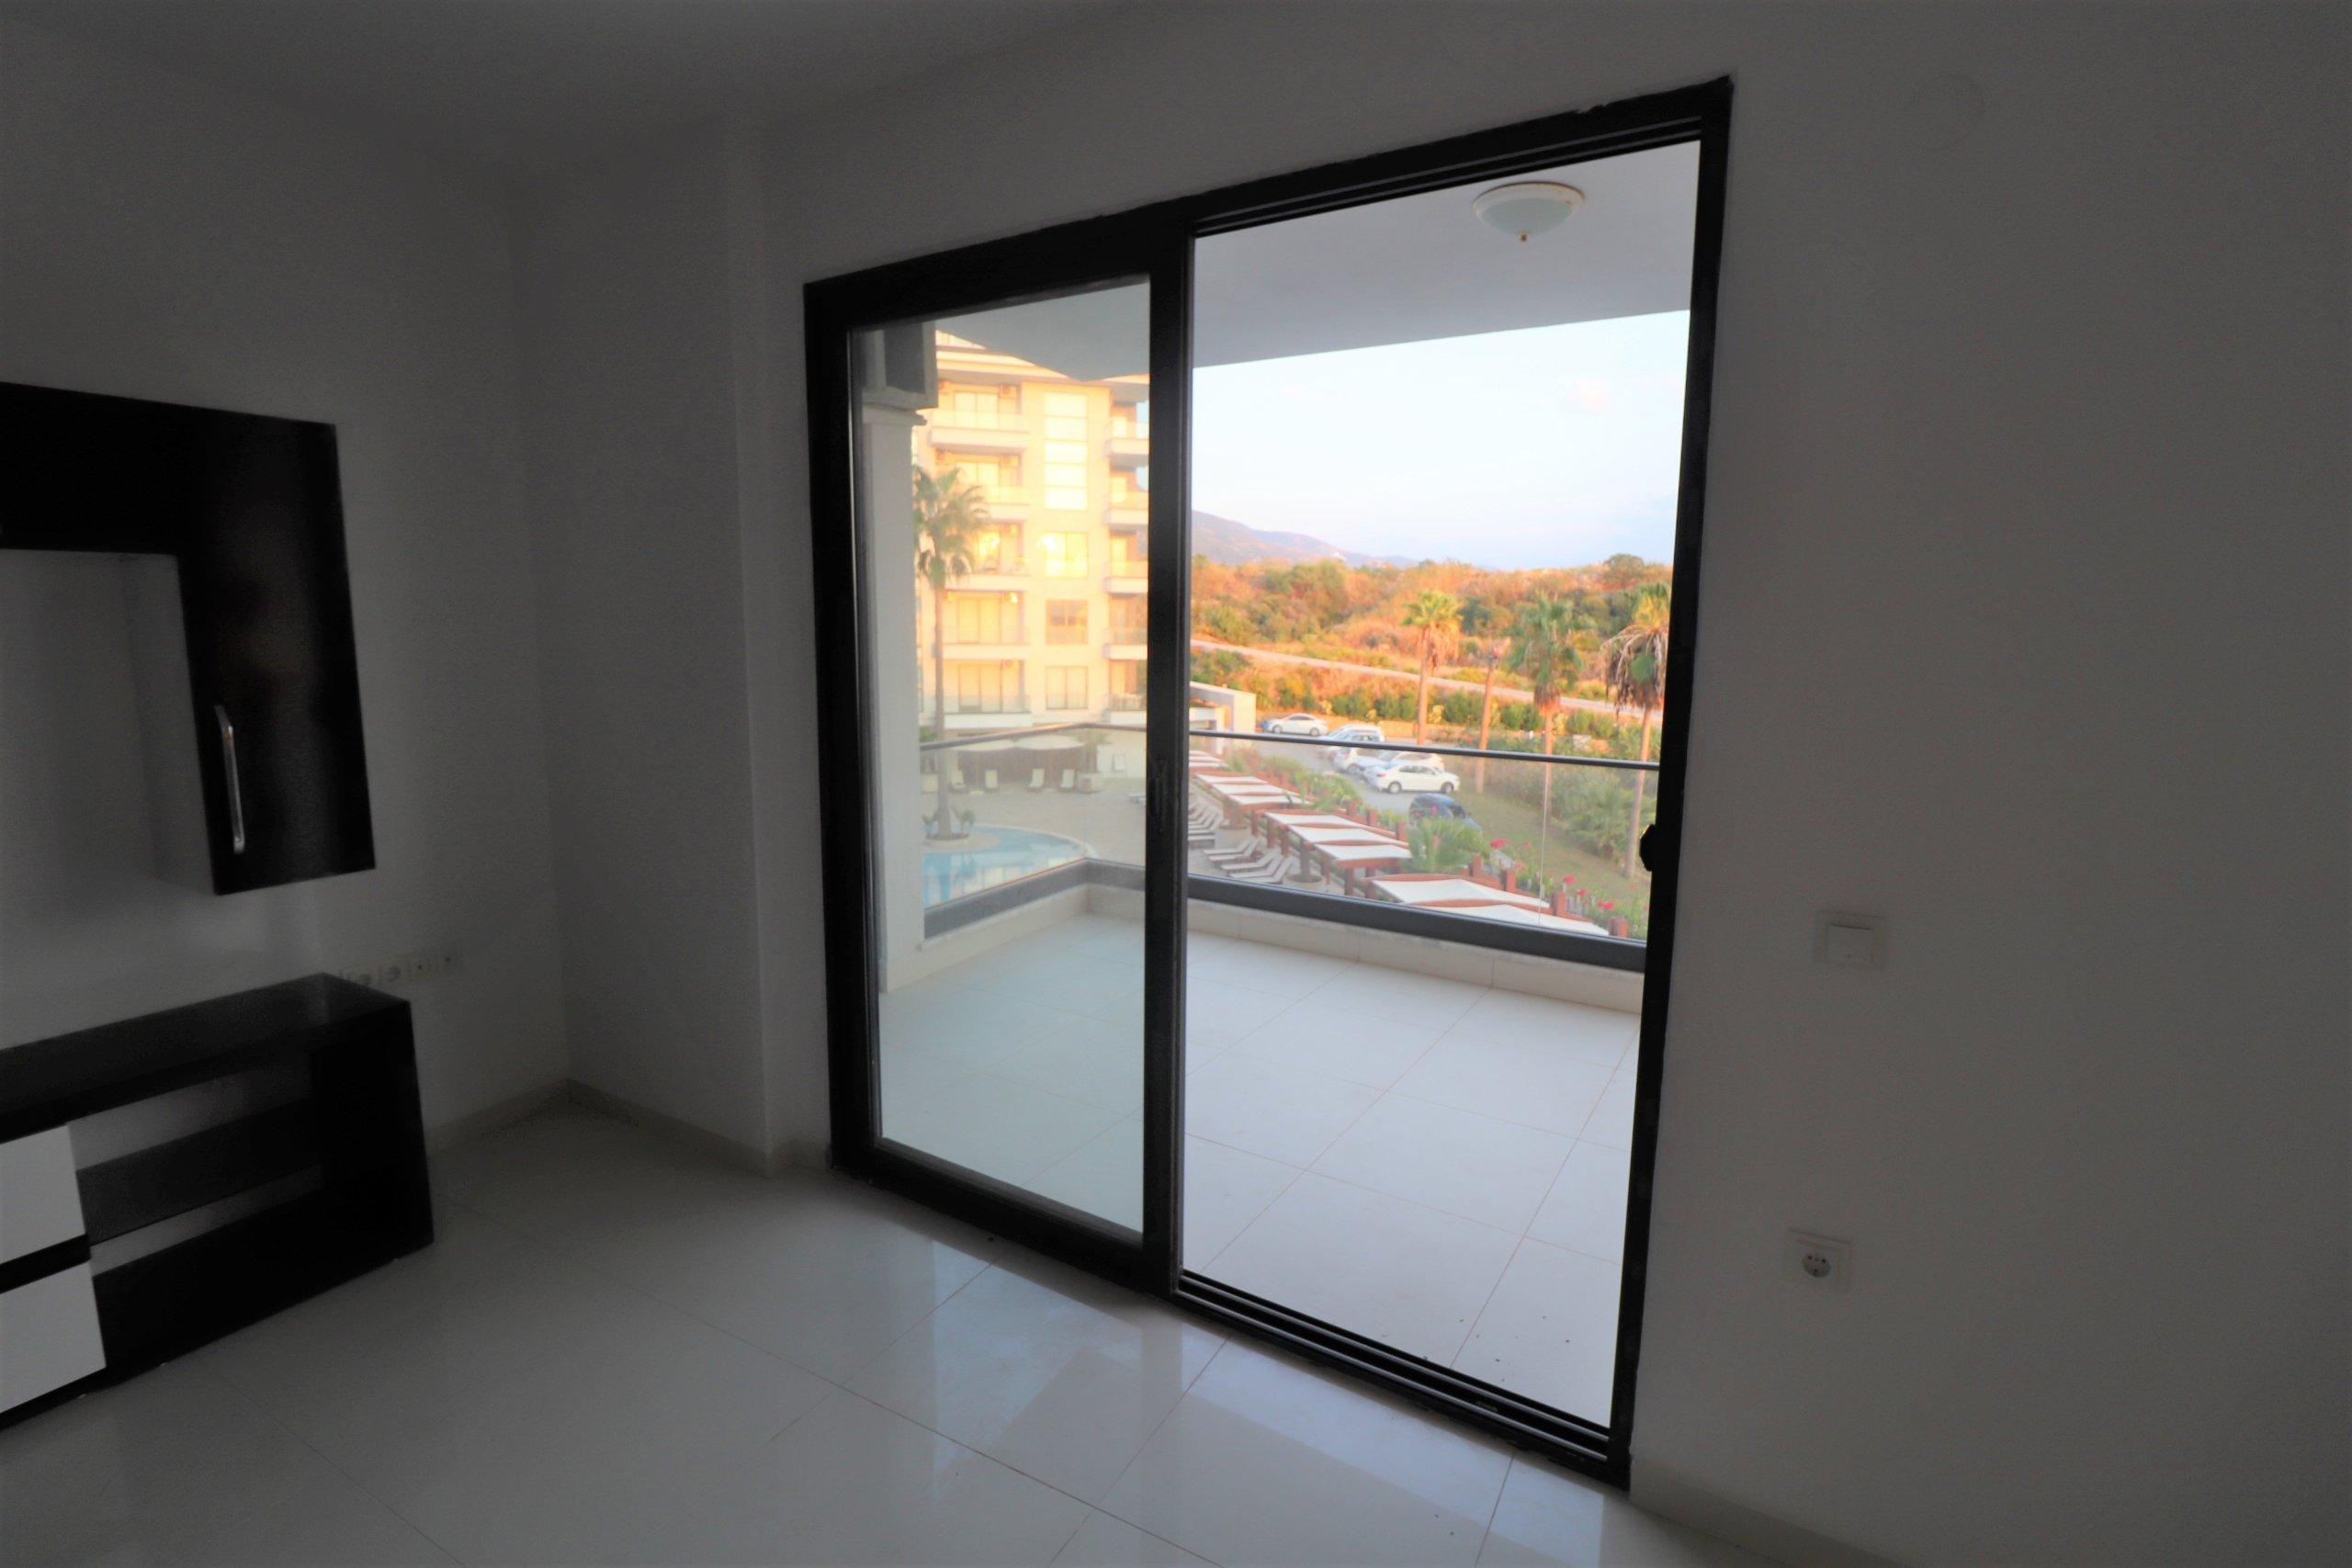 1+1  квартира в элитном комплексе  на берегу моря